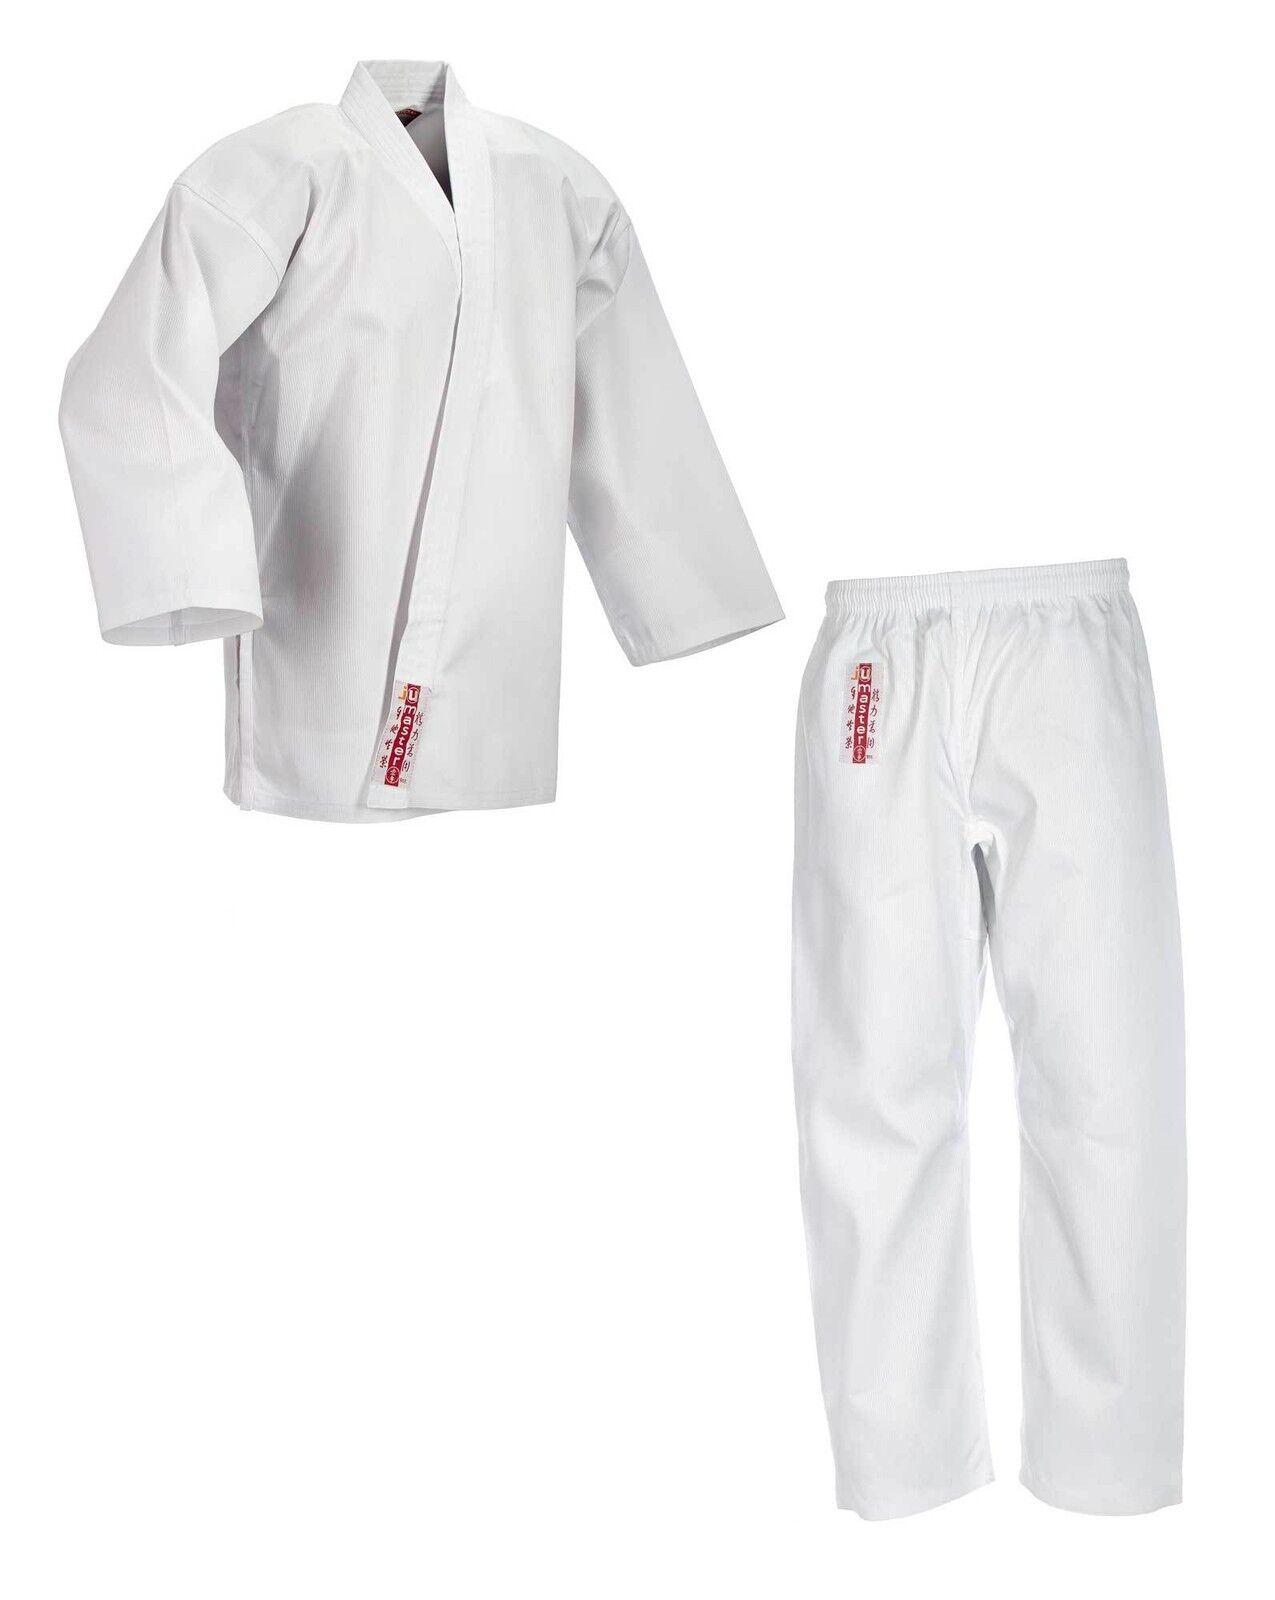 Ju-Sports  Karateanzug Kumite - leichter Stoff Stoff Stoff - Wettkampfanzug Karate Anzug 179614